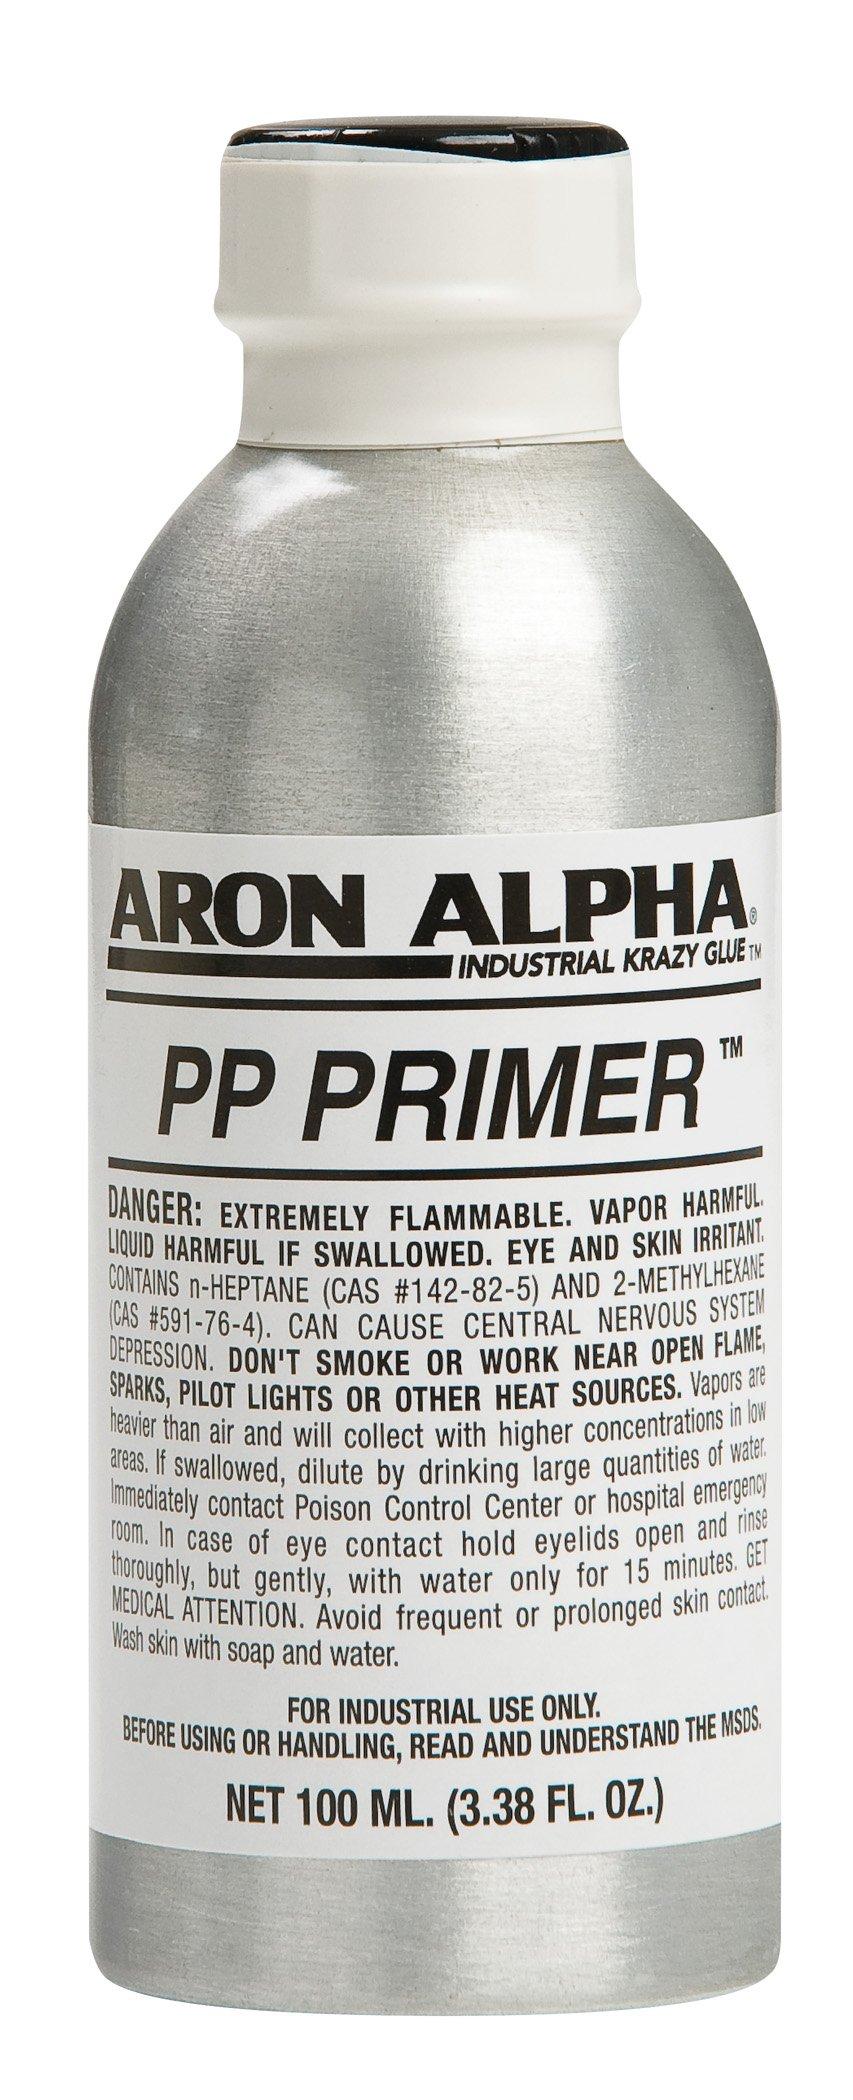 Aron Alpha PP Primer For Use With Instant Adhesives To Bond Polyolefine Plastics, 100ml (3.38 oz)